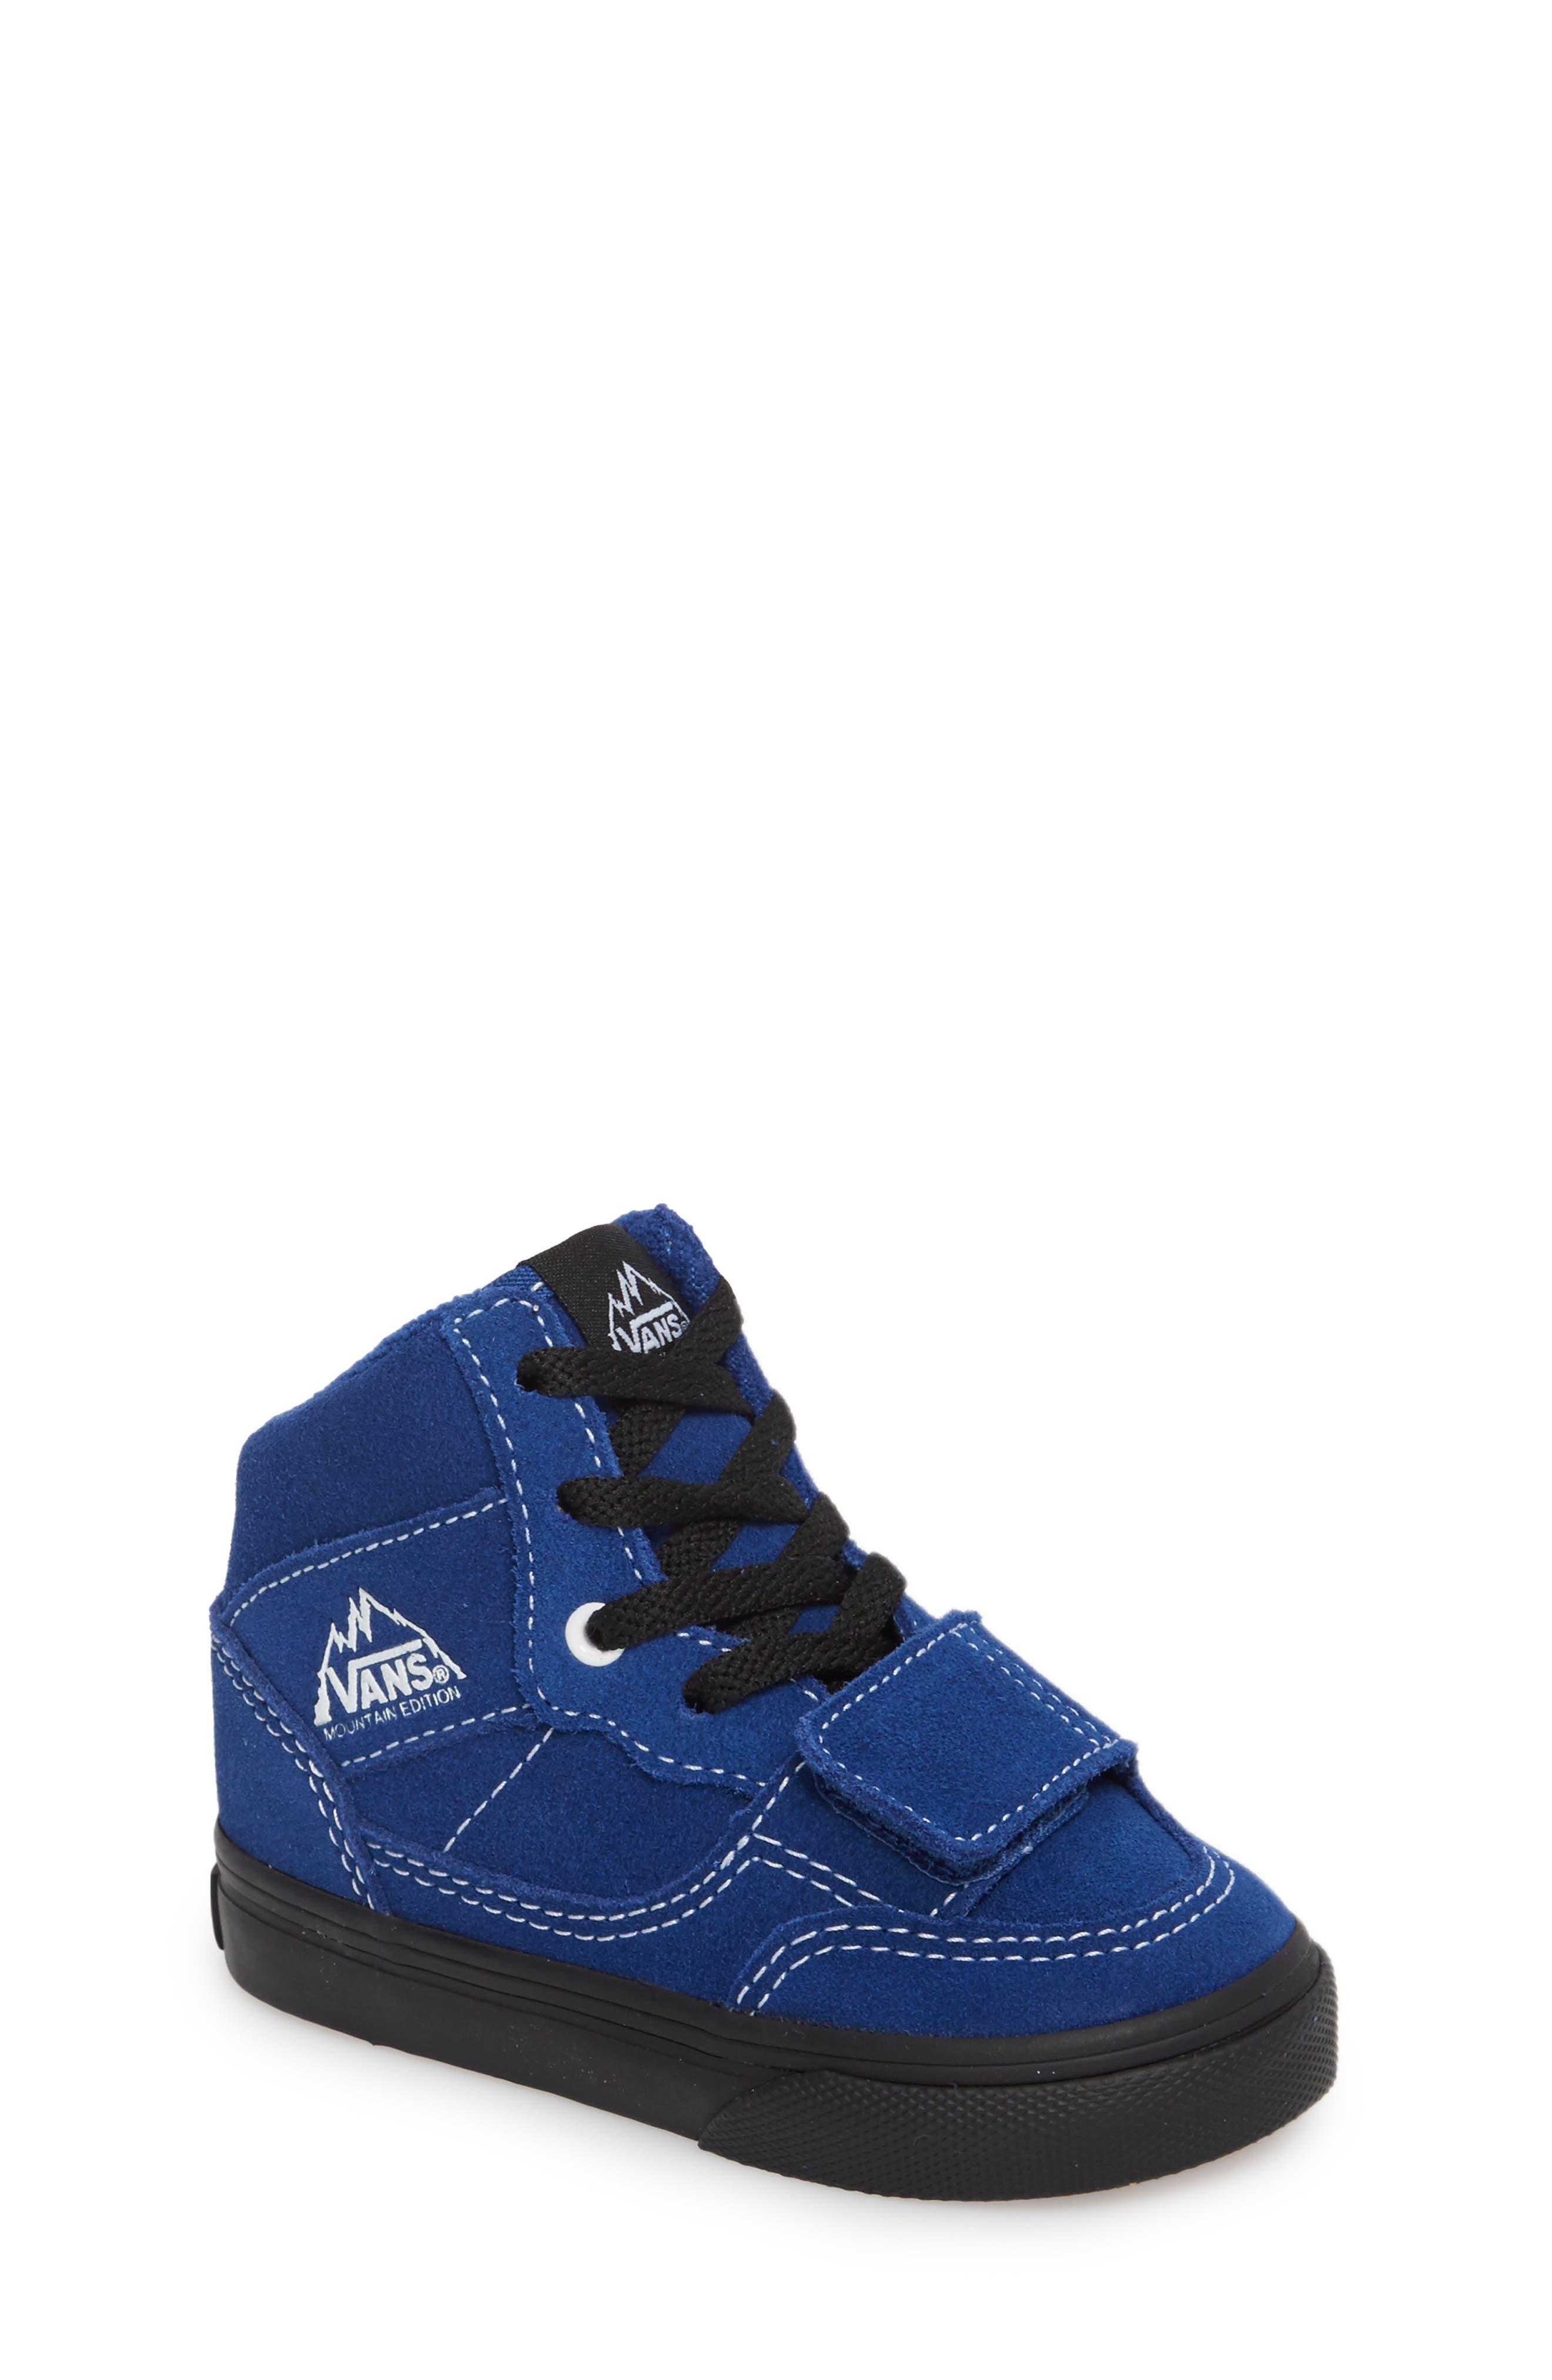 Mountain Edition Mid Top Sneaker,                             Main thumbnail 1, color,                             Blue/ Black